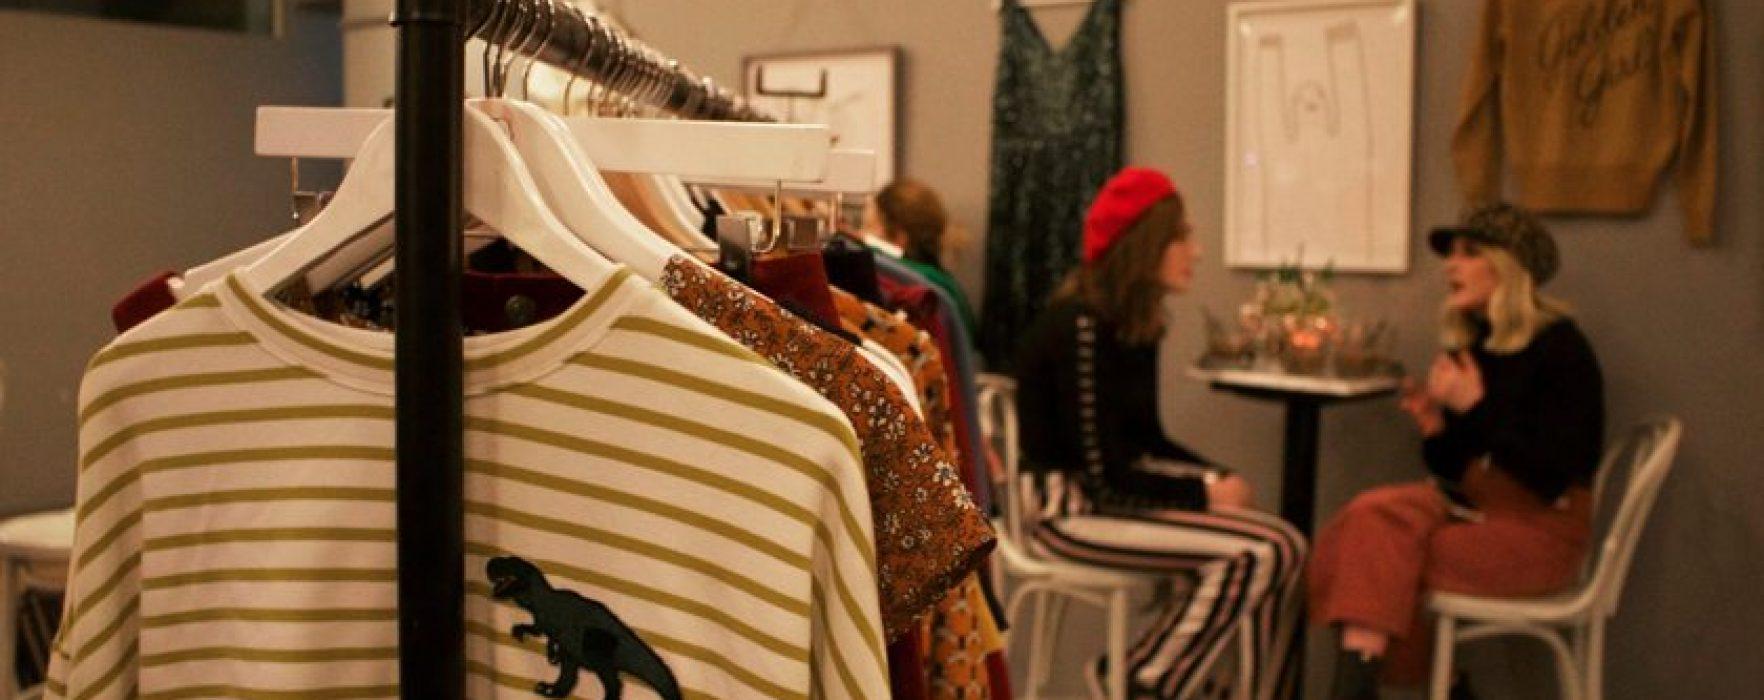 Christmas Season – Joanie Clothing A/W17 Christmas Event